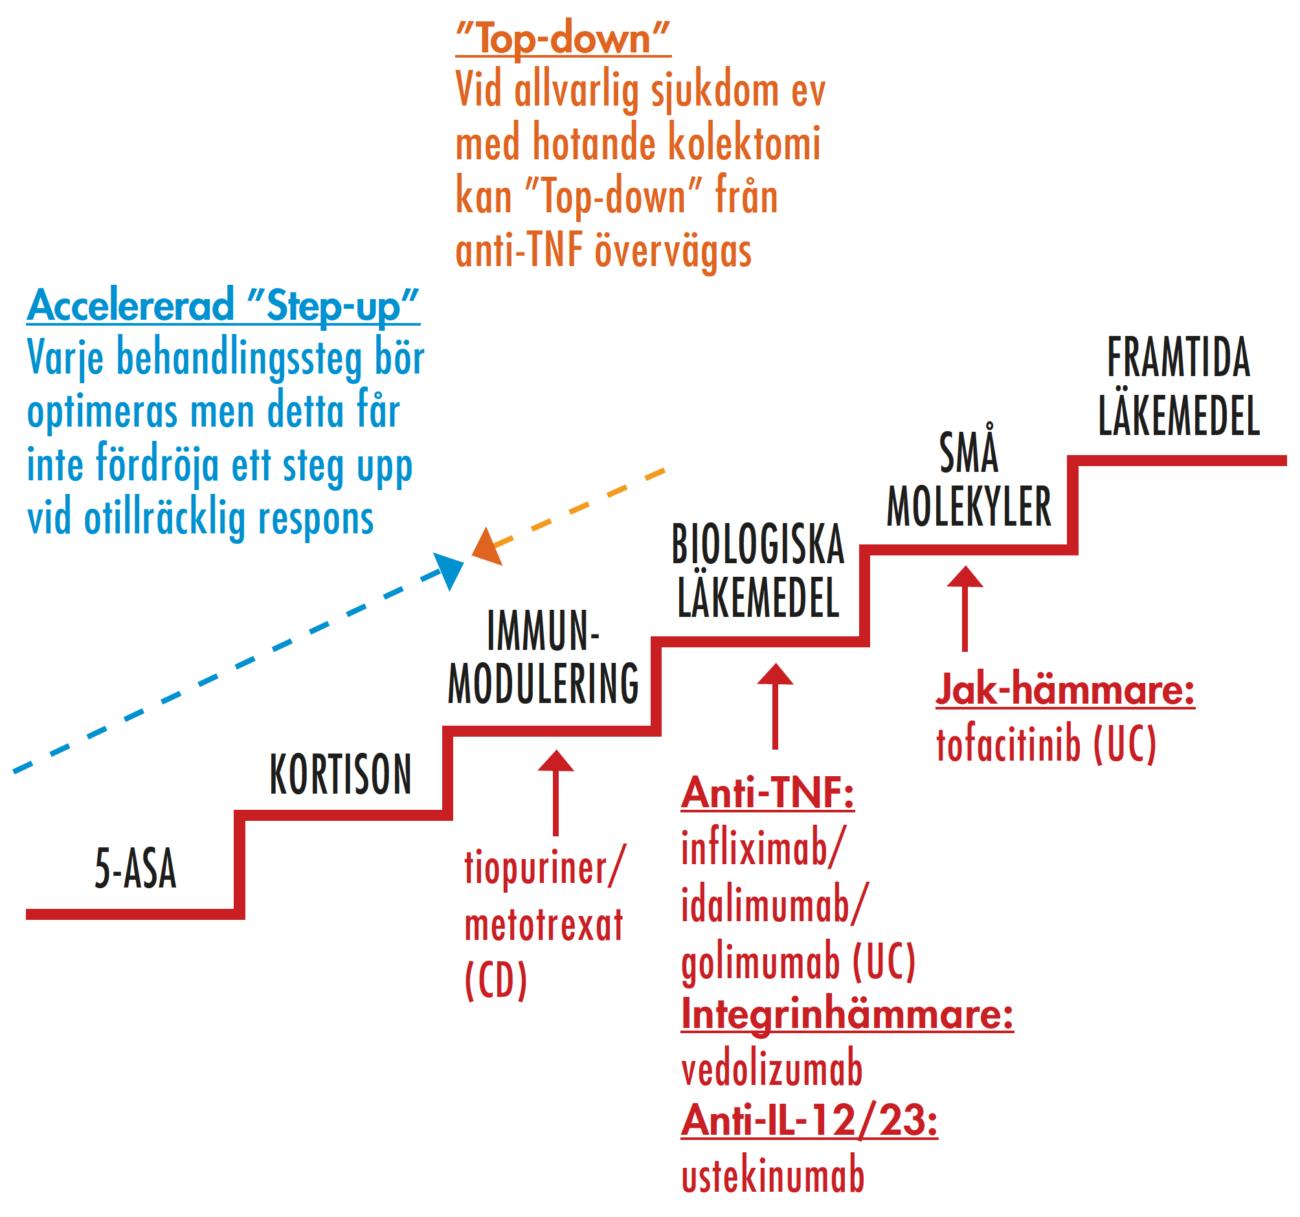 Figur 4. Medicinsk behandling vid IBD – behandlingstrappan.